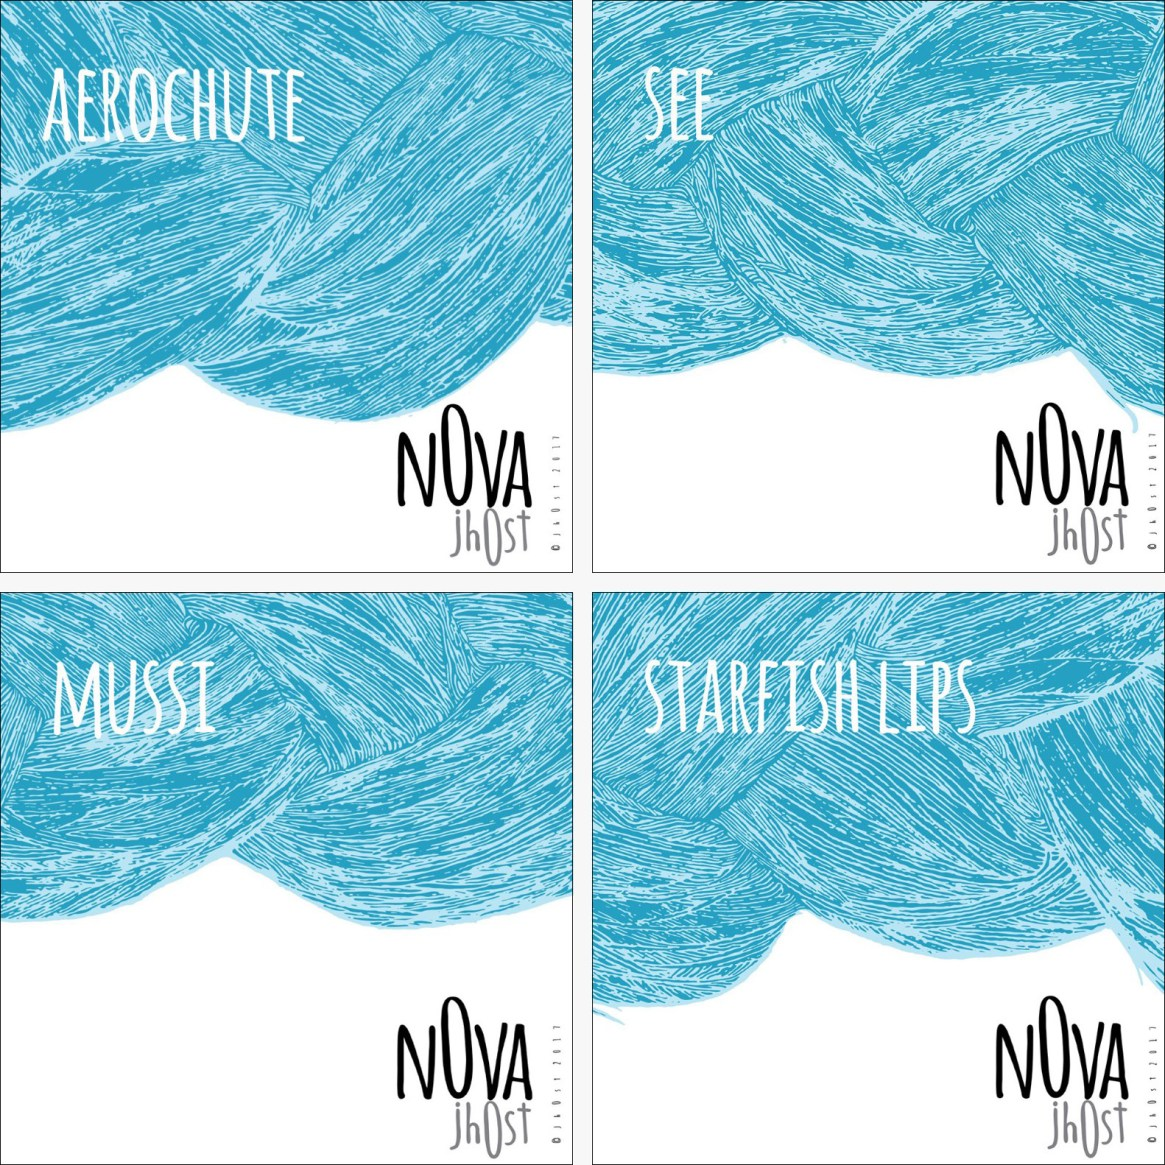 n0va-artwork-by Jin Suk